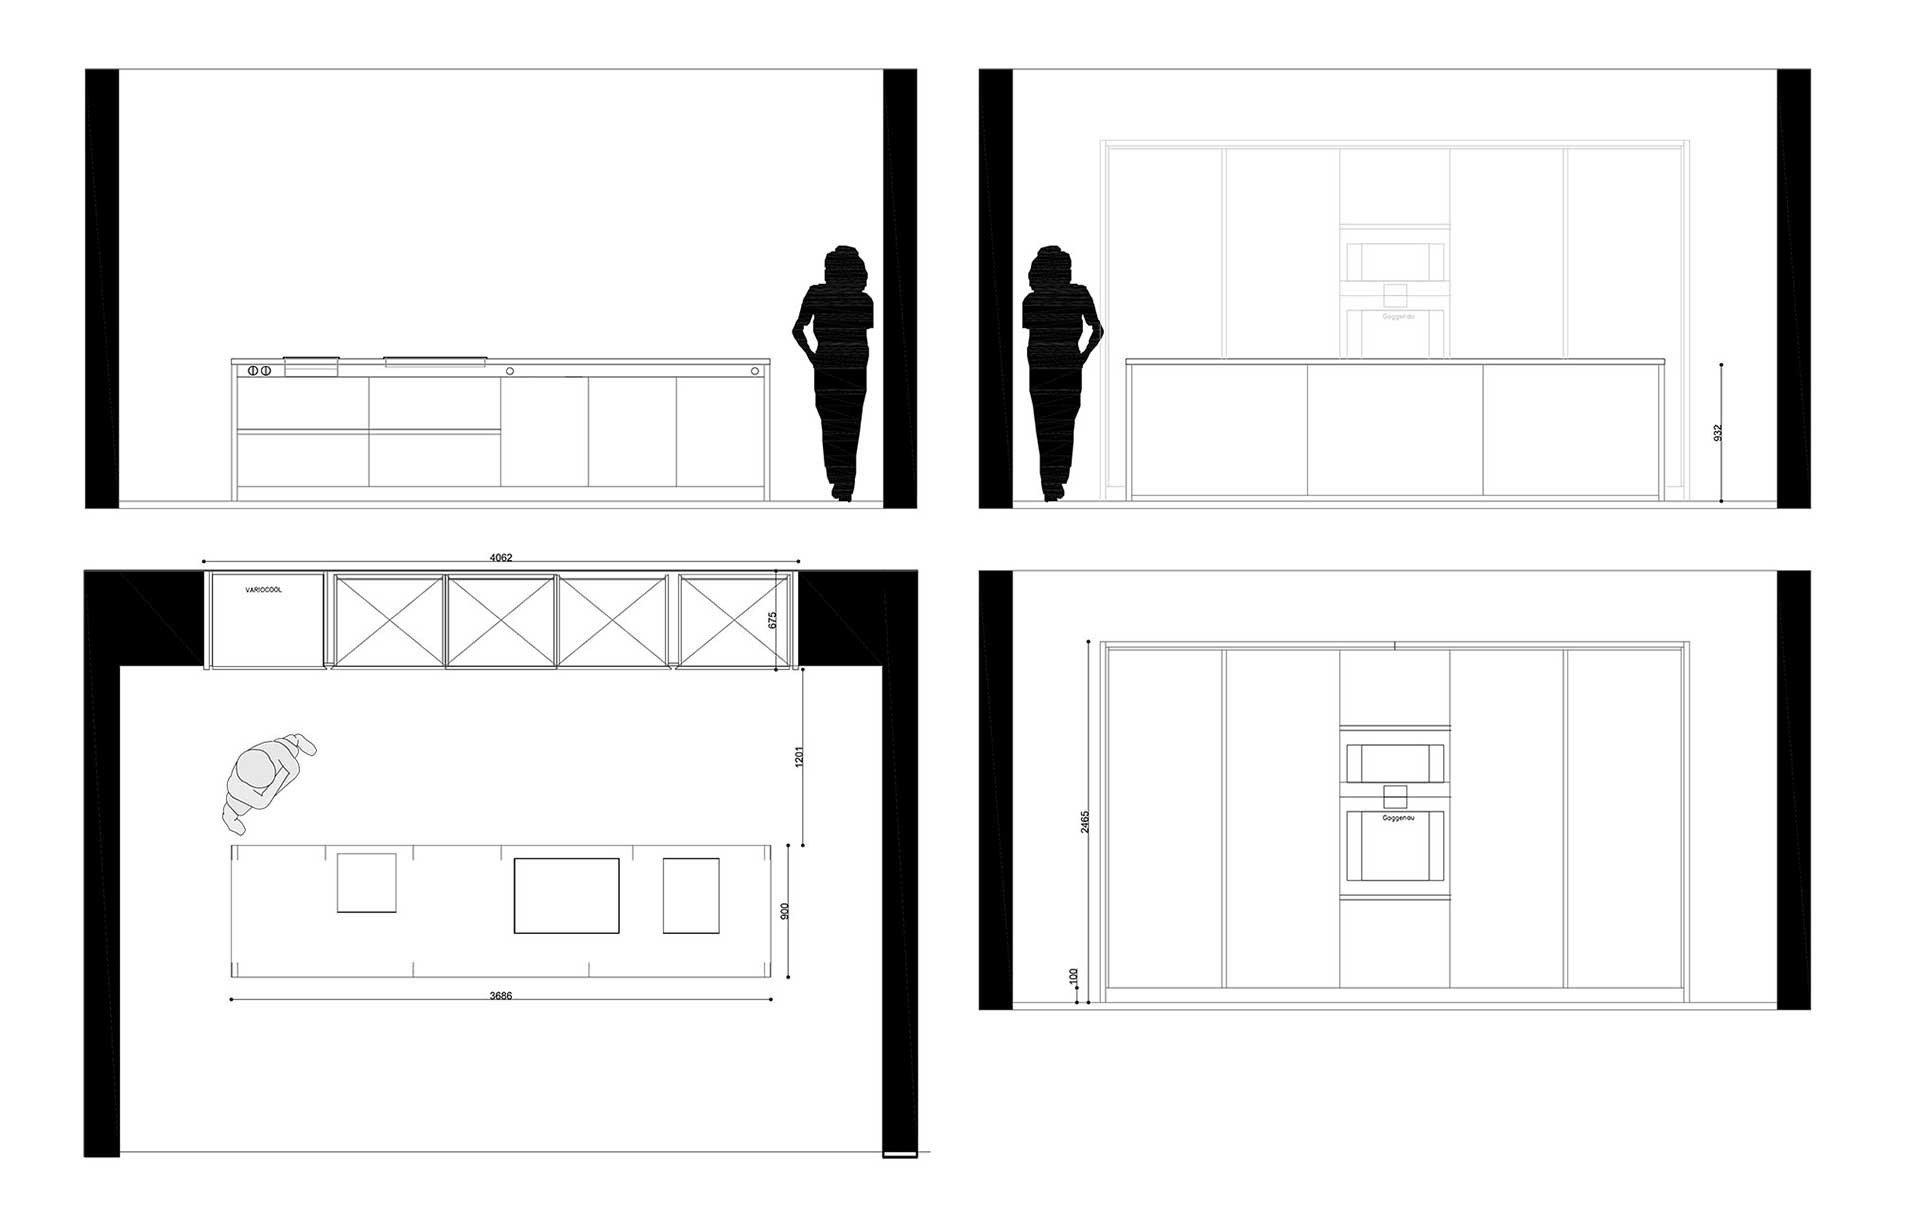 Toonzaalkeuken-BeverenWaas-BOX3-Fineer-CarbonBlack-grondplan.jpg